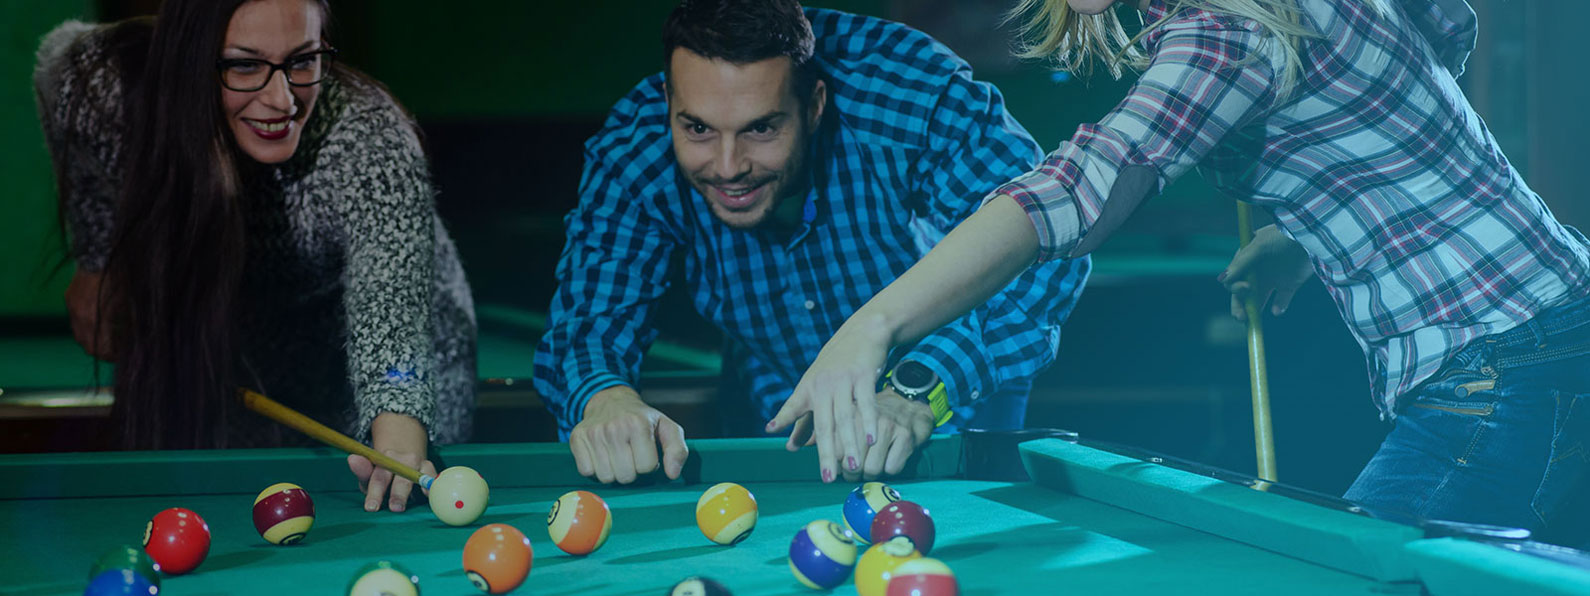 People enjoying a game of billiards